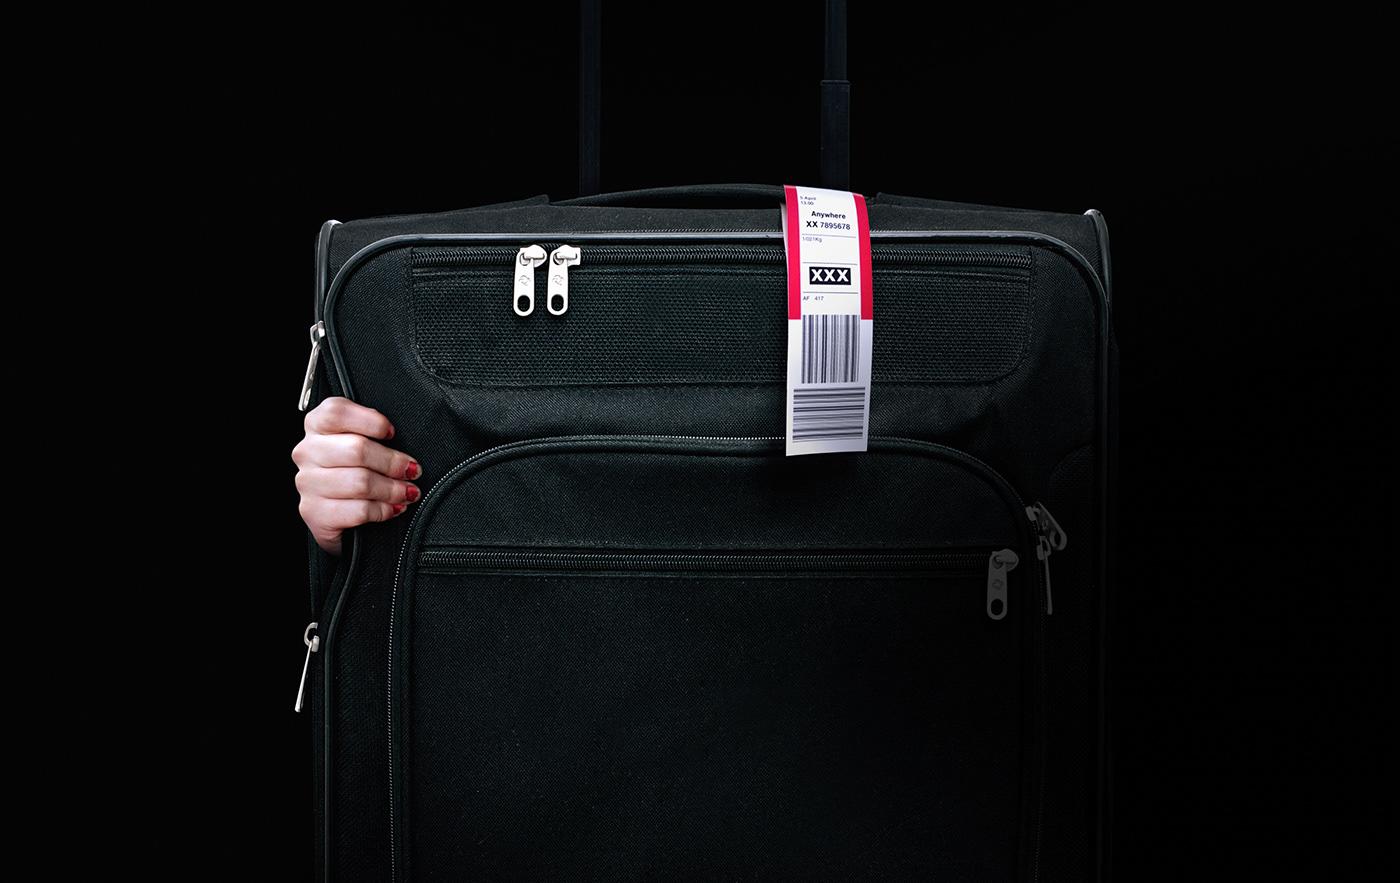 child abuse Despair hand human trafficking suitcase COVID-19 crime black hole Fashion